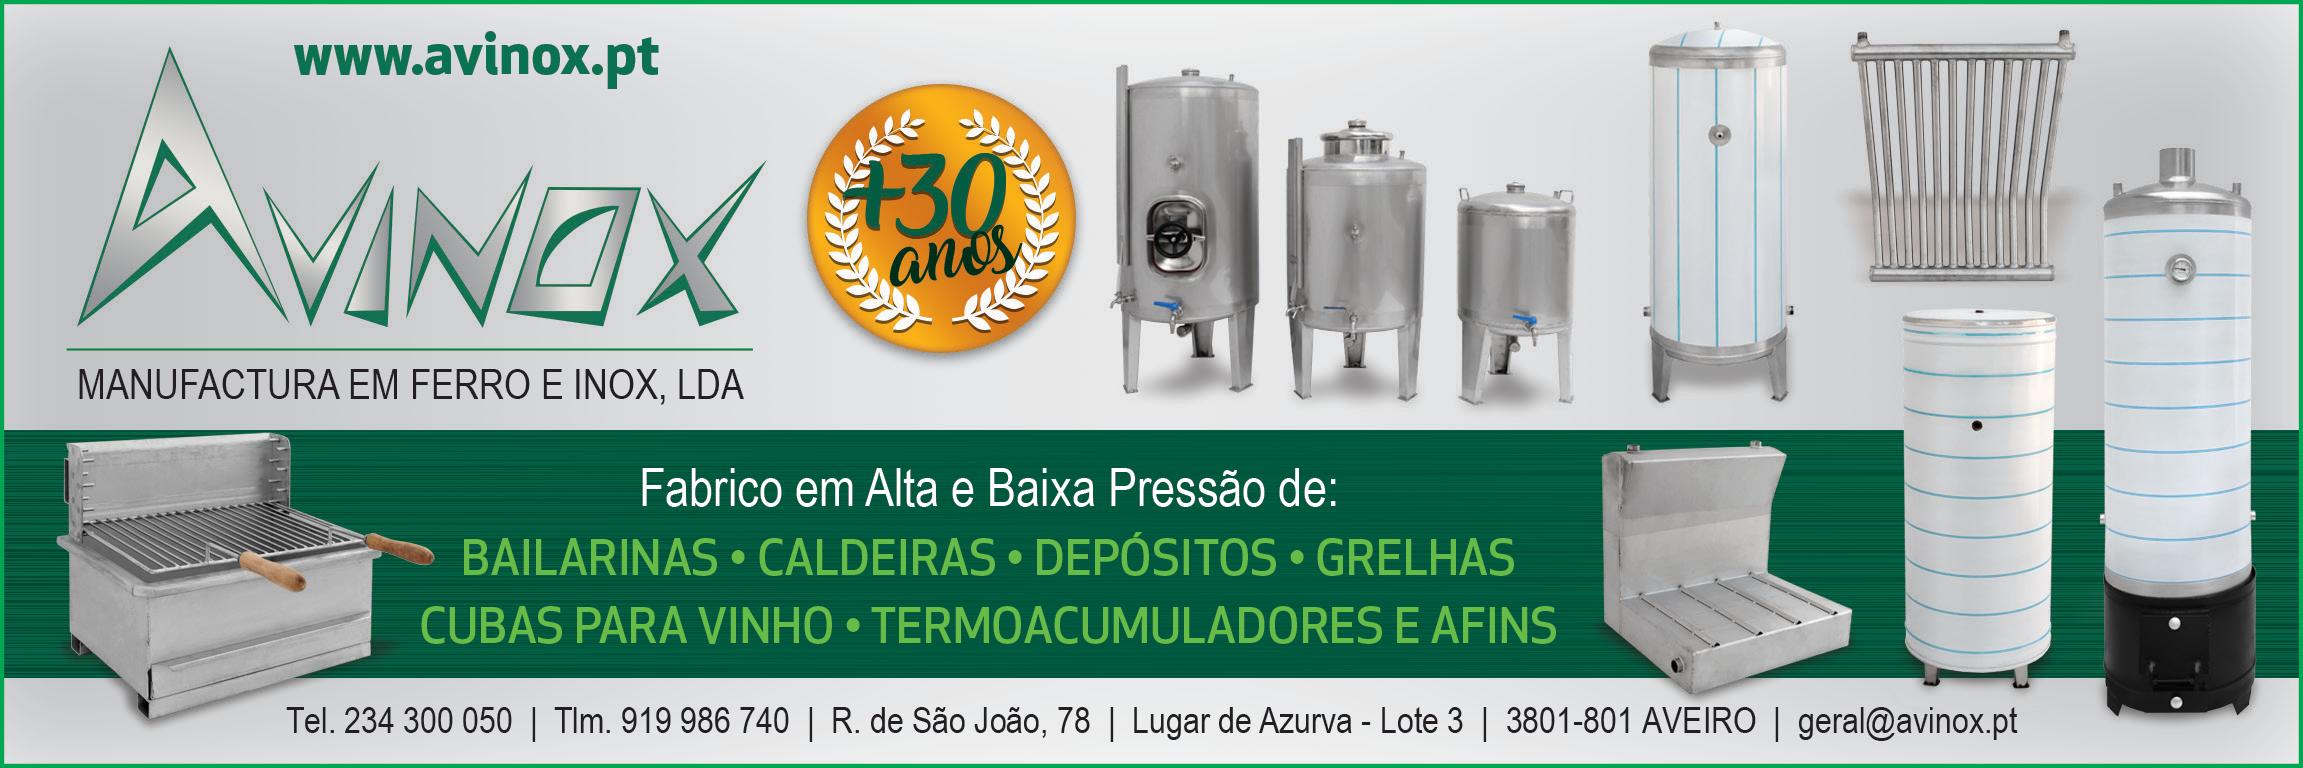 AVINOX • MANUFACTURA EM FERRO E INOX, LDA.